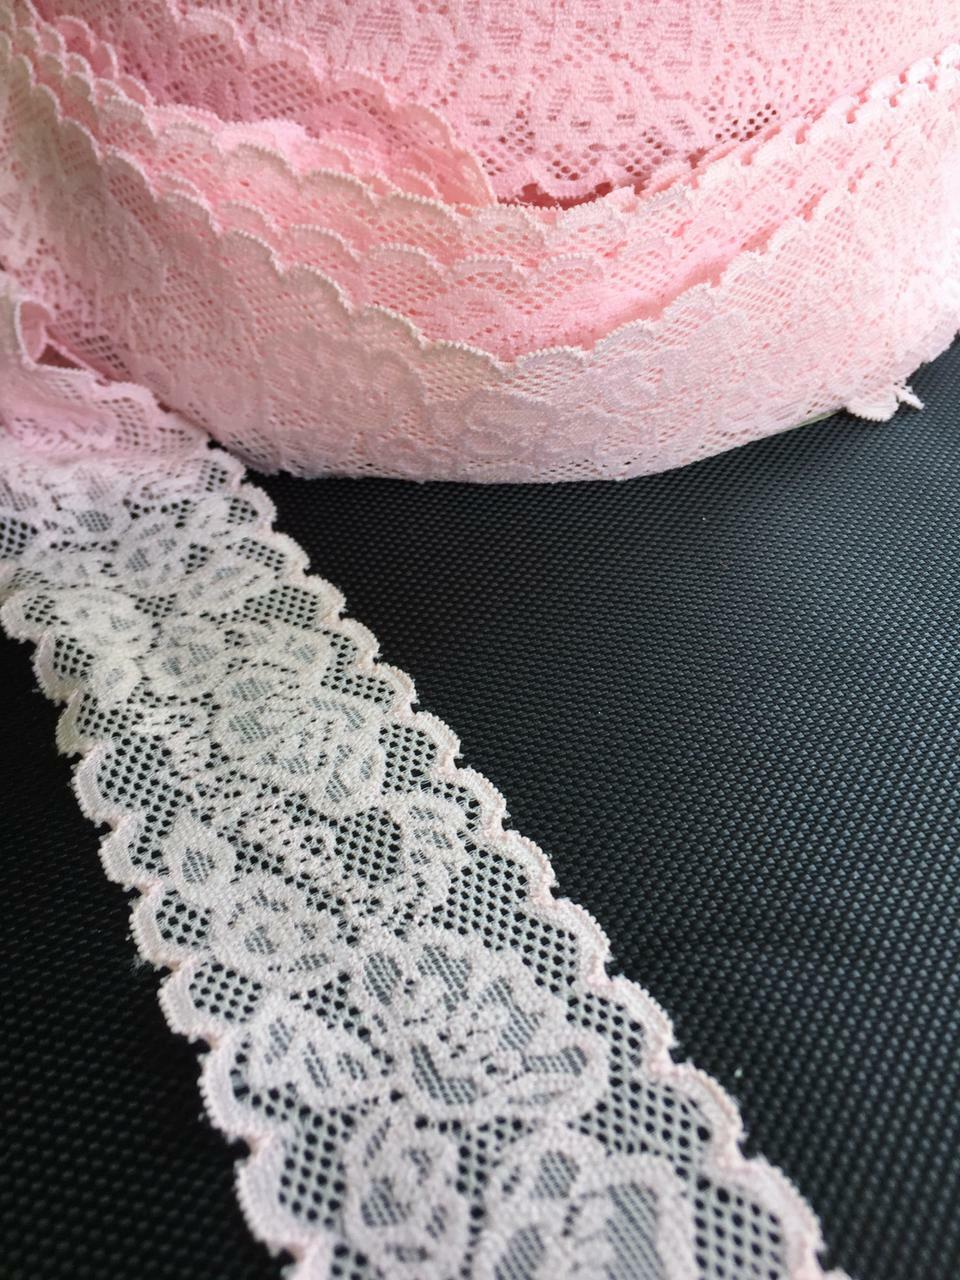 10m/3m Nylon Spitze Borte Elegante 4, 5cm Pink elastisch stoff  NR